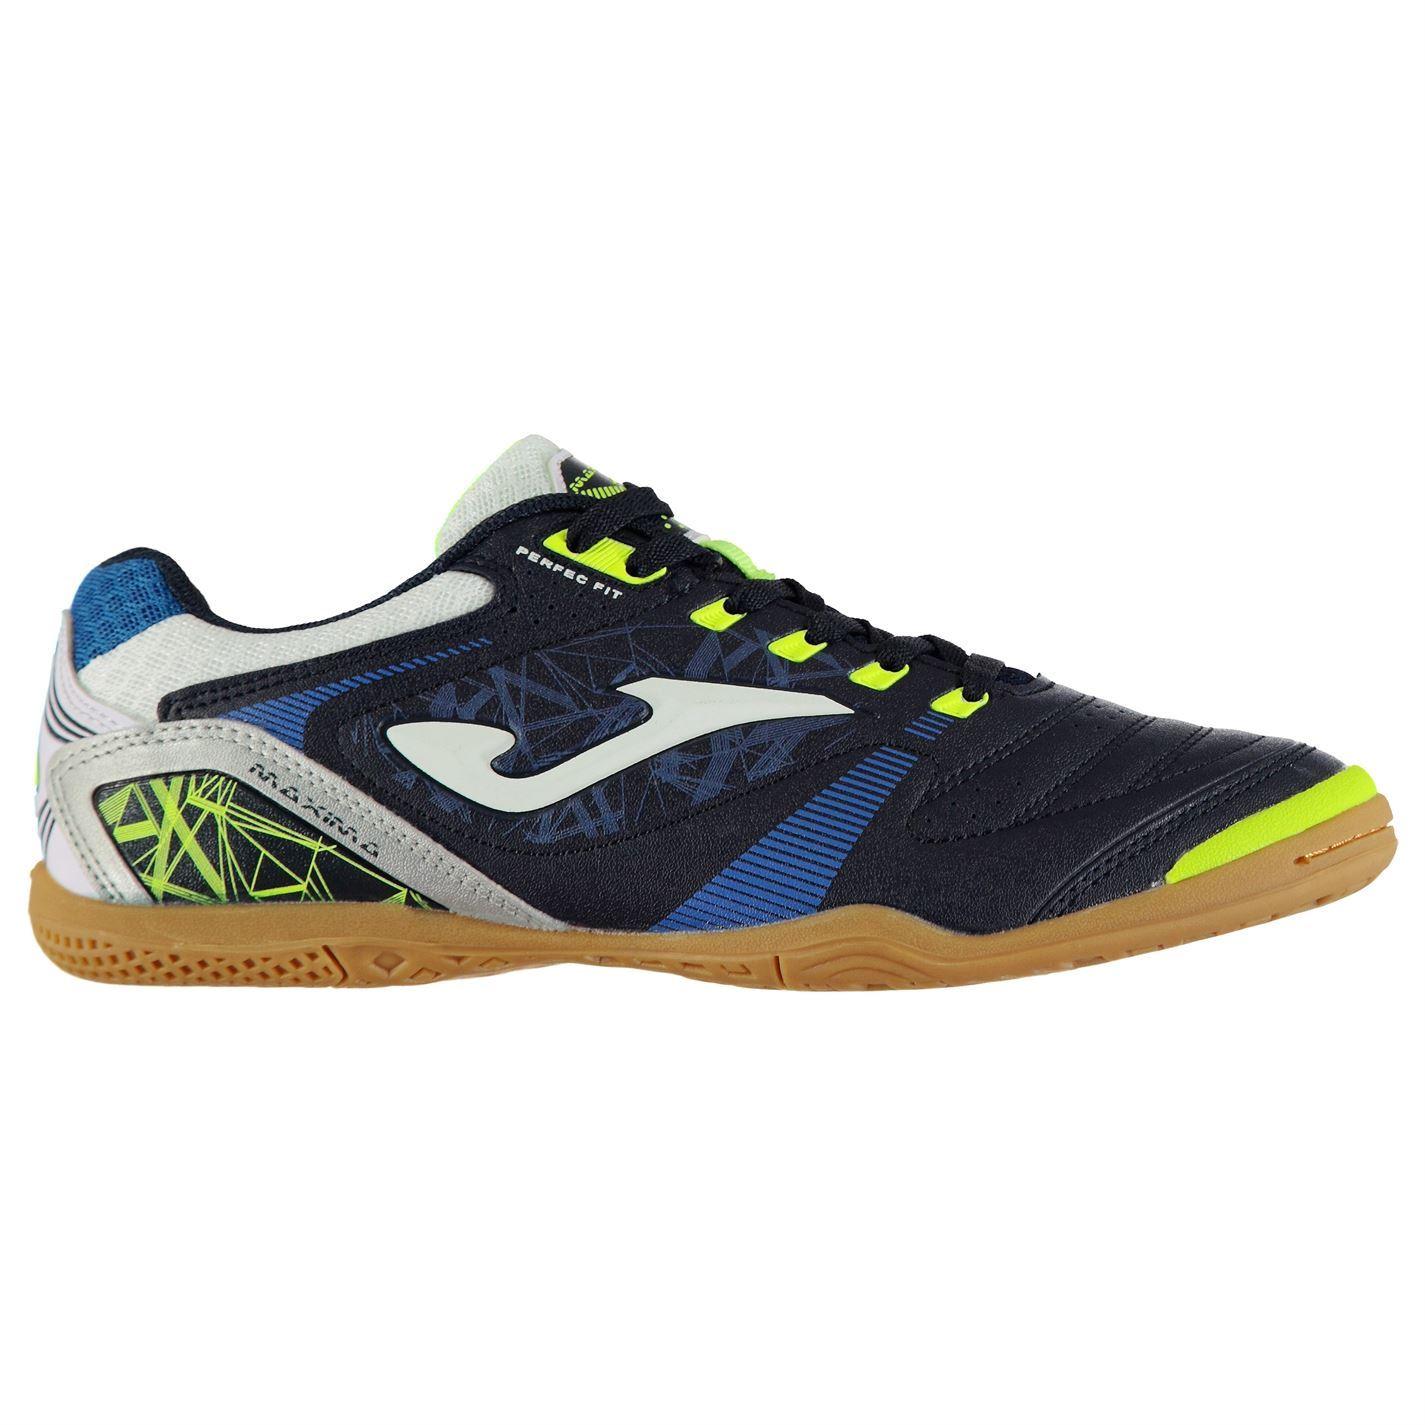 e4deef21c33 Joma Maxima Indoor Football Trainers Mens Soccer Futsal Shoes ...